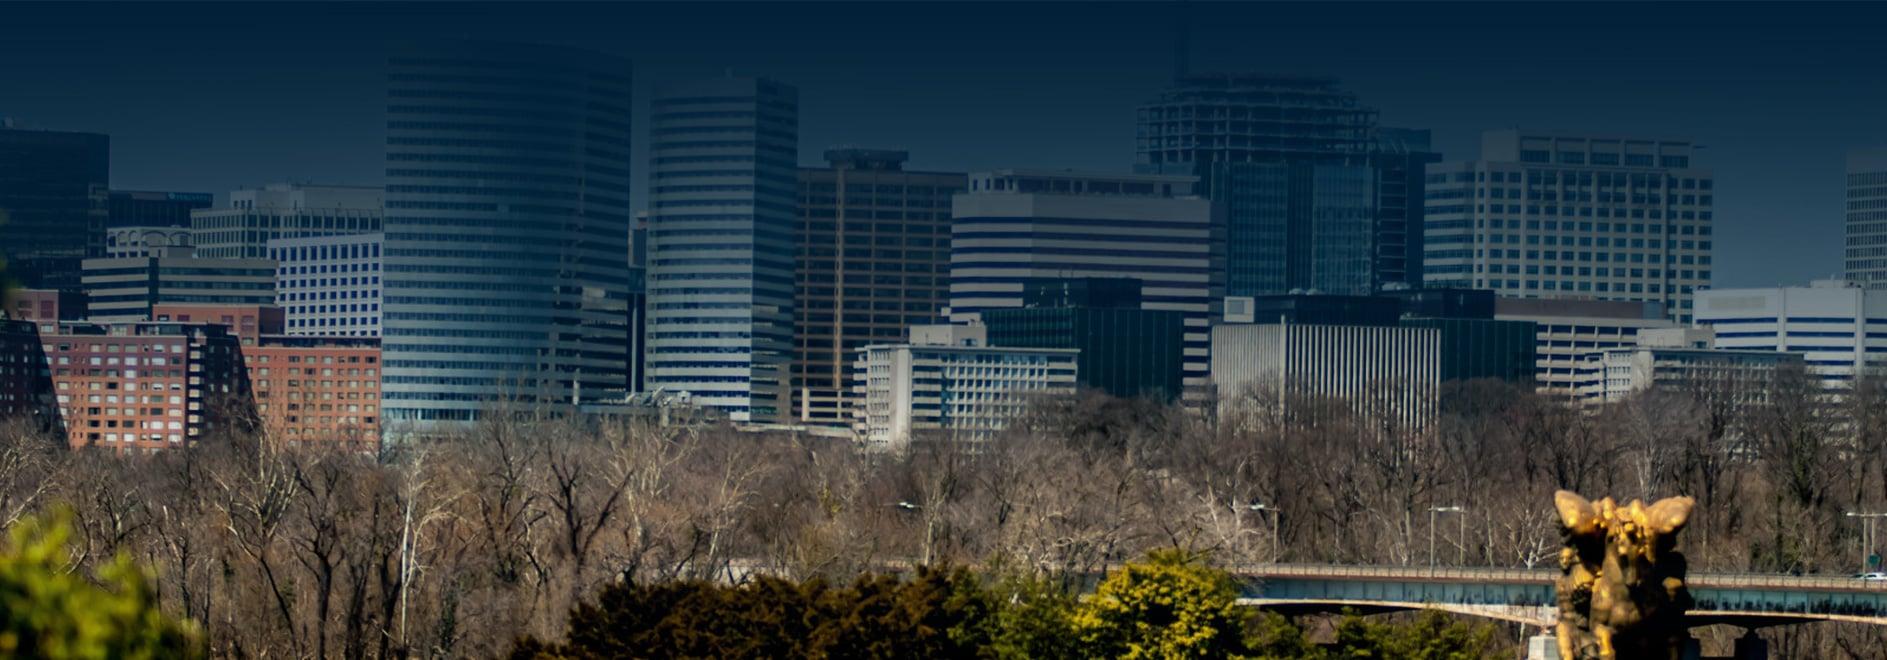 #1 BUSINESS WEBSITE DESIGN IN ARLINGTON VA